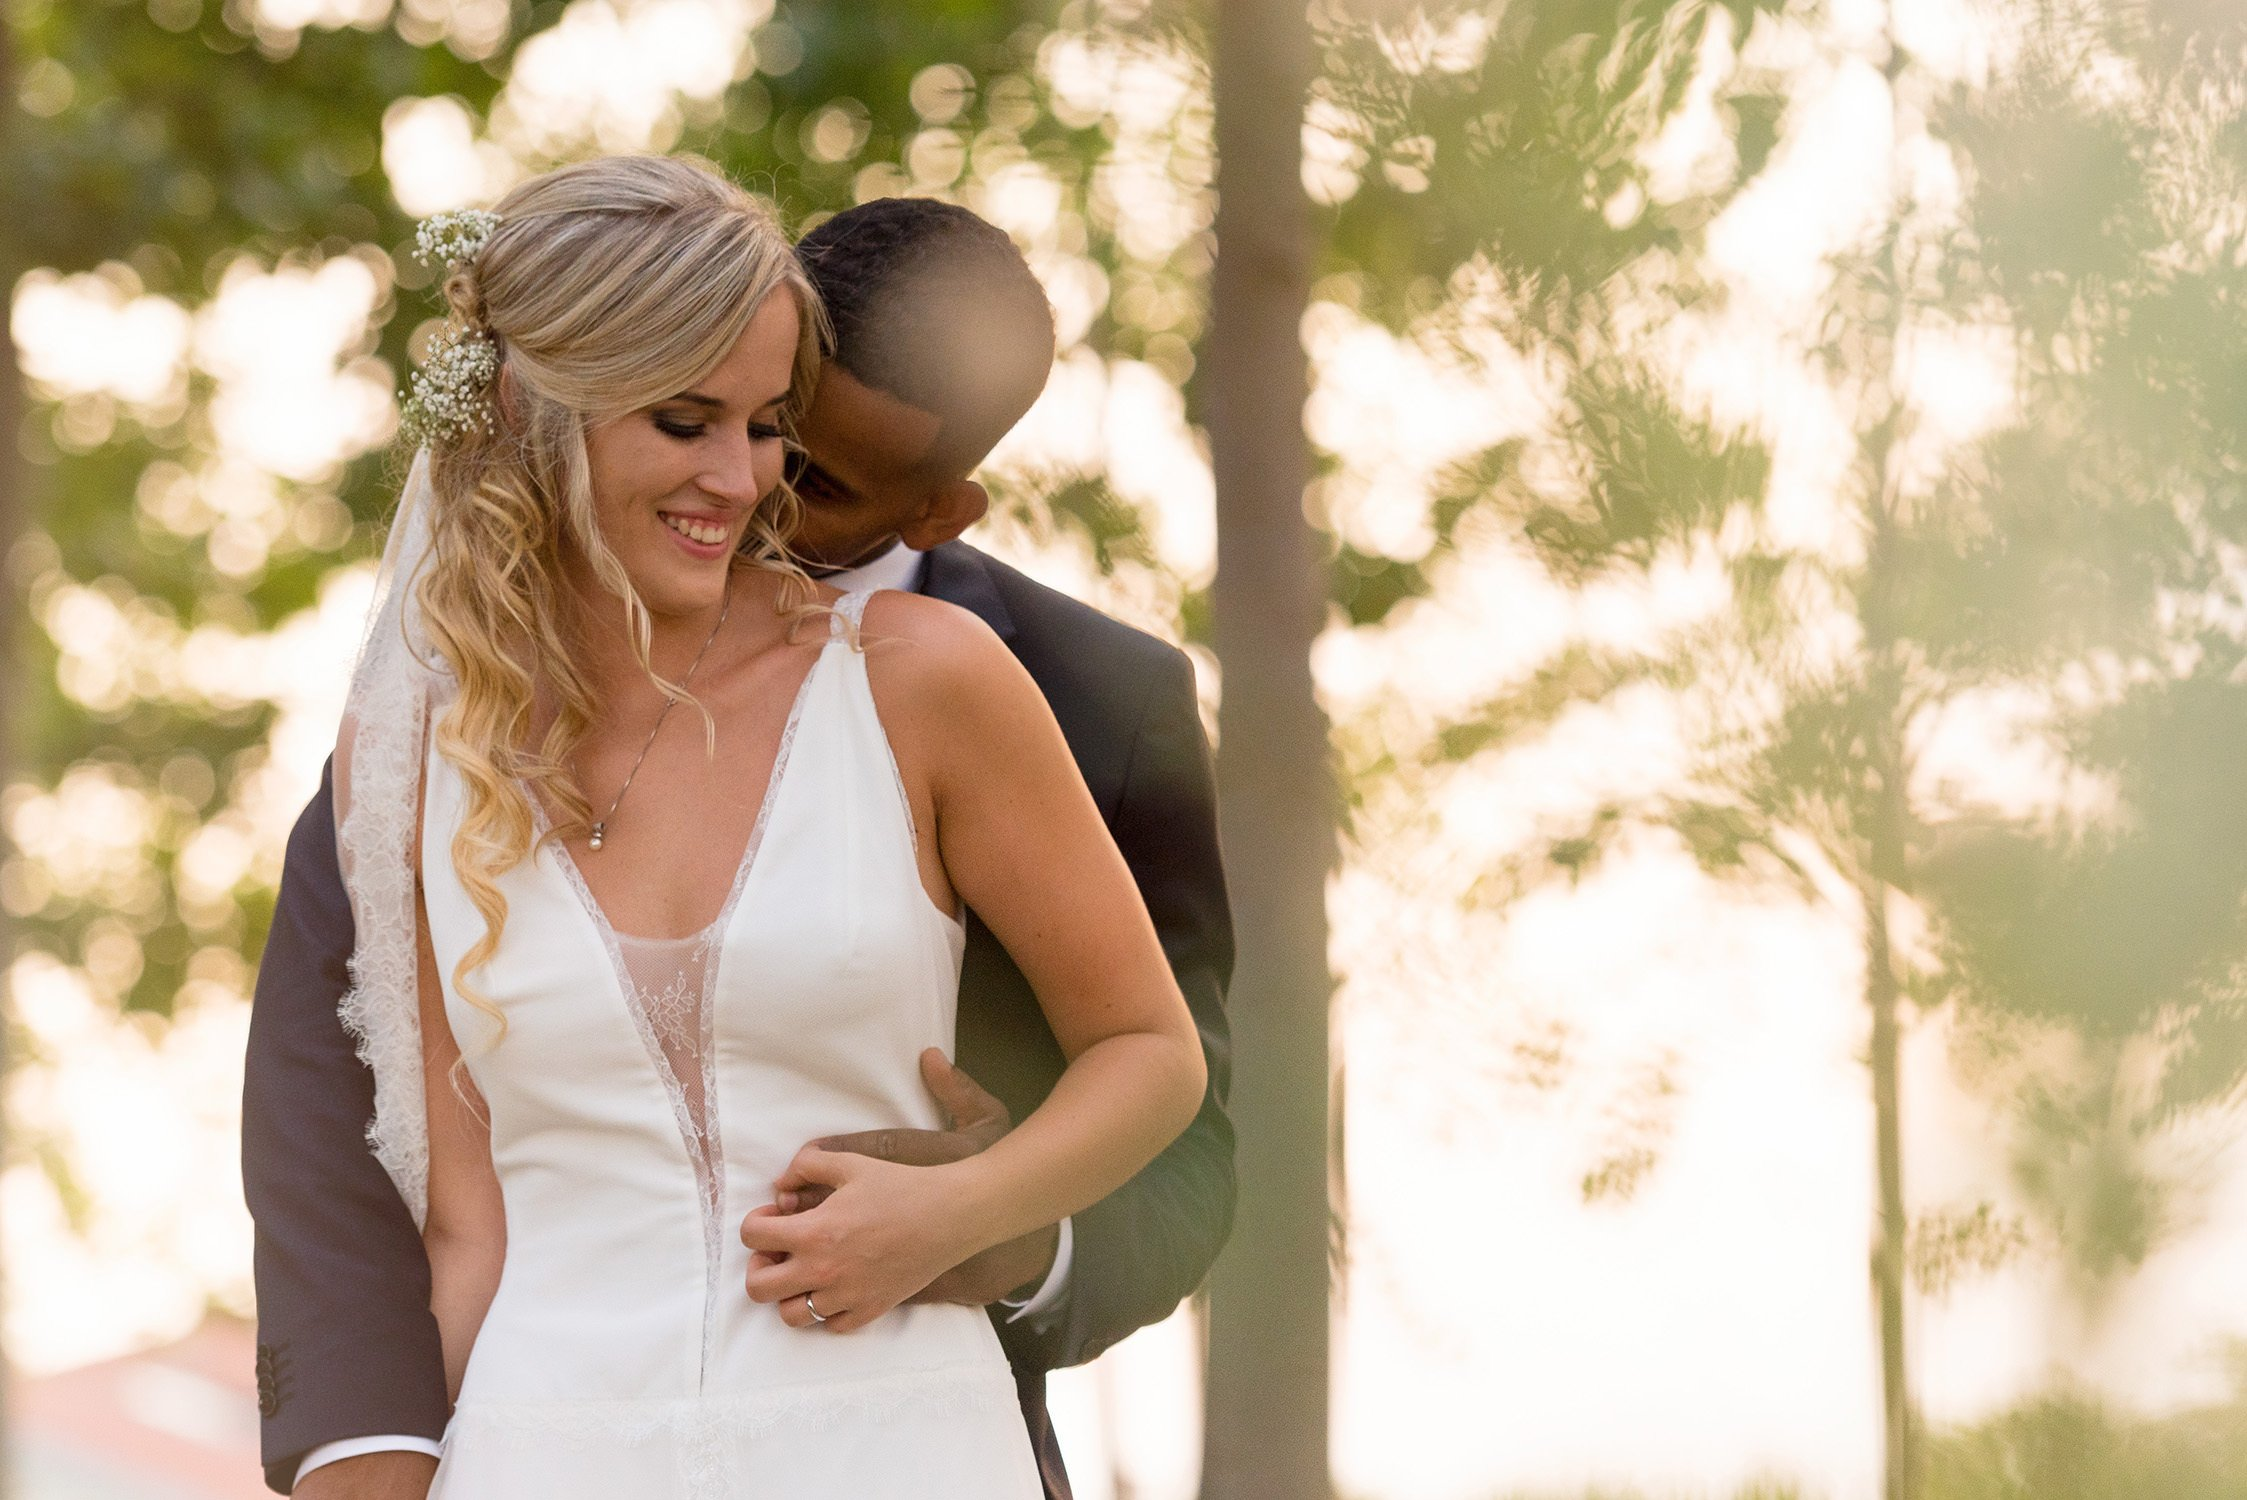 Matrimonio Anna e Rafael. Luisa Basso Wedding Photographer. cerimonia Bocon Divino camposampiero. Italian Wedding photographer